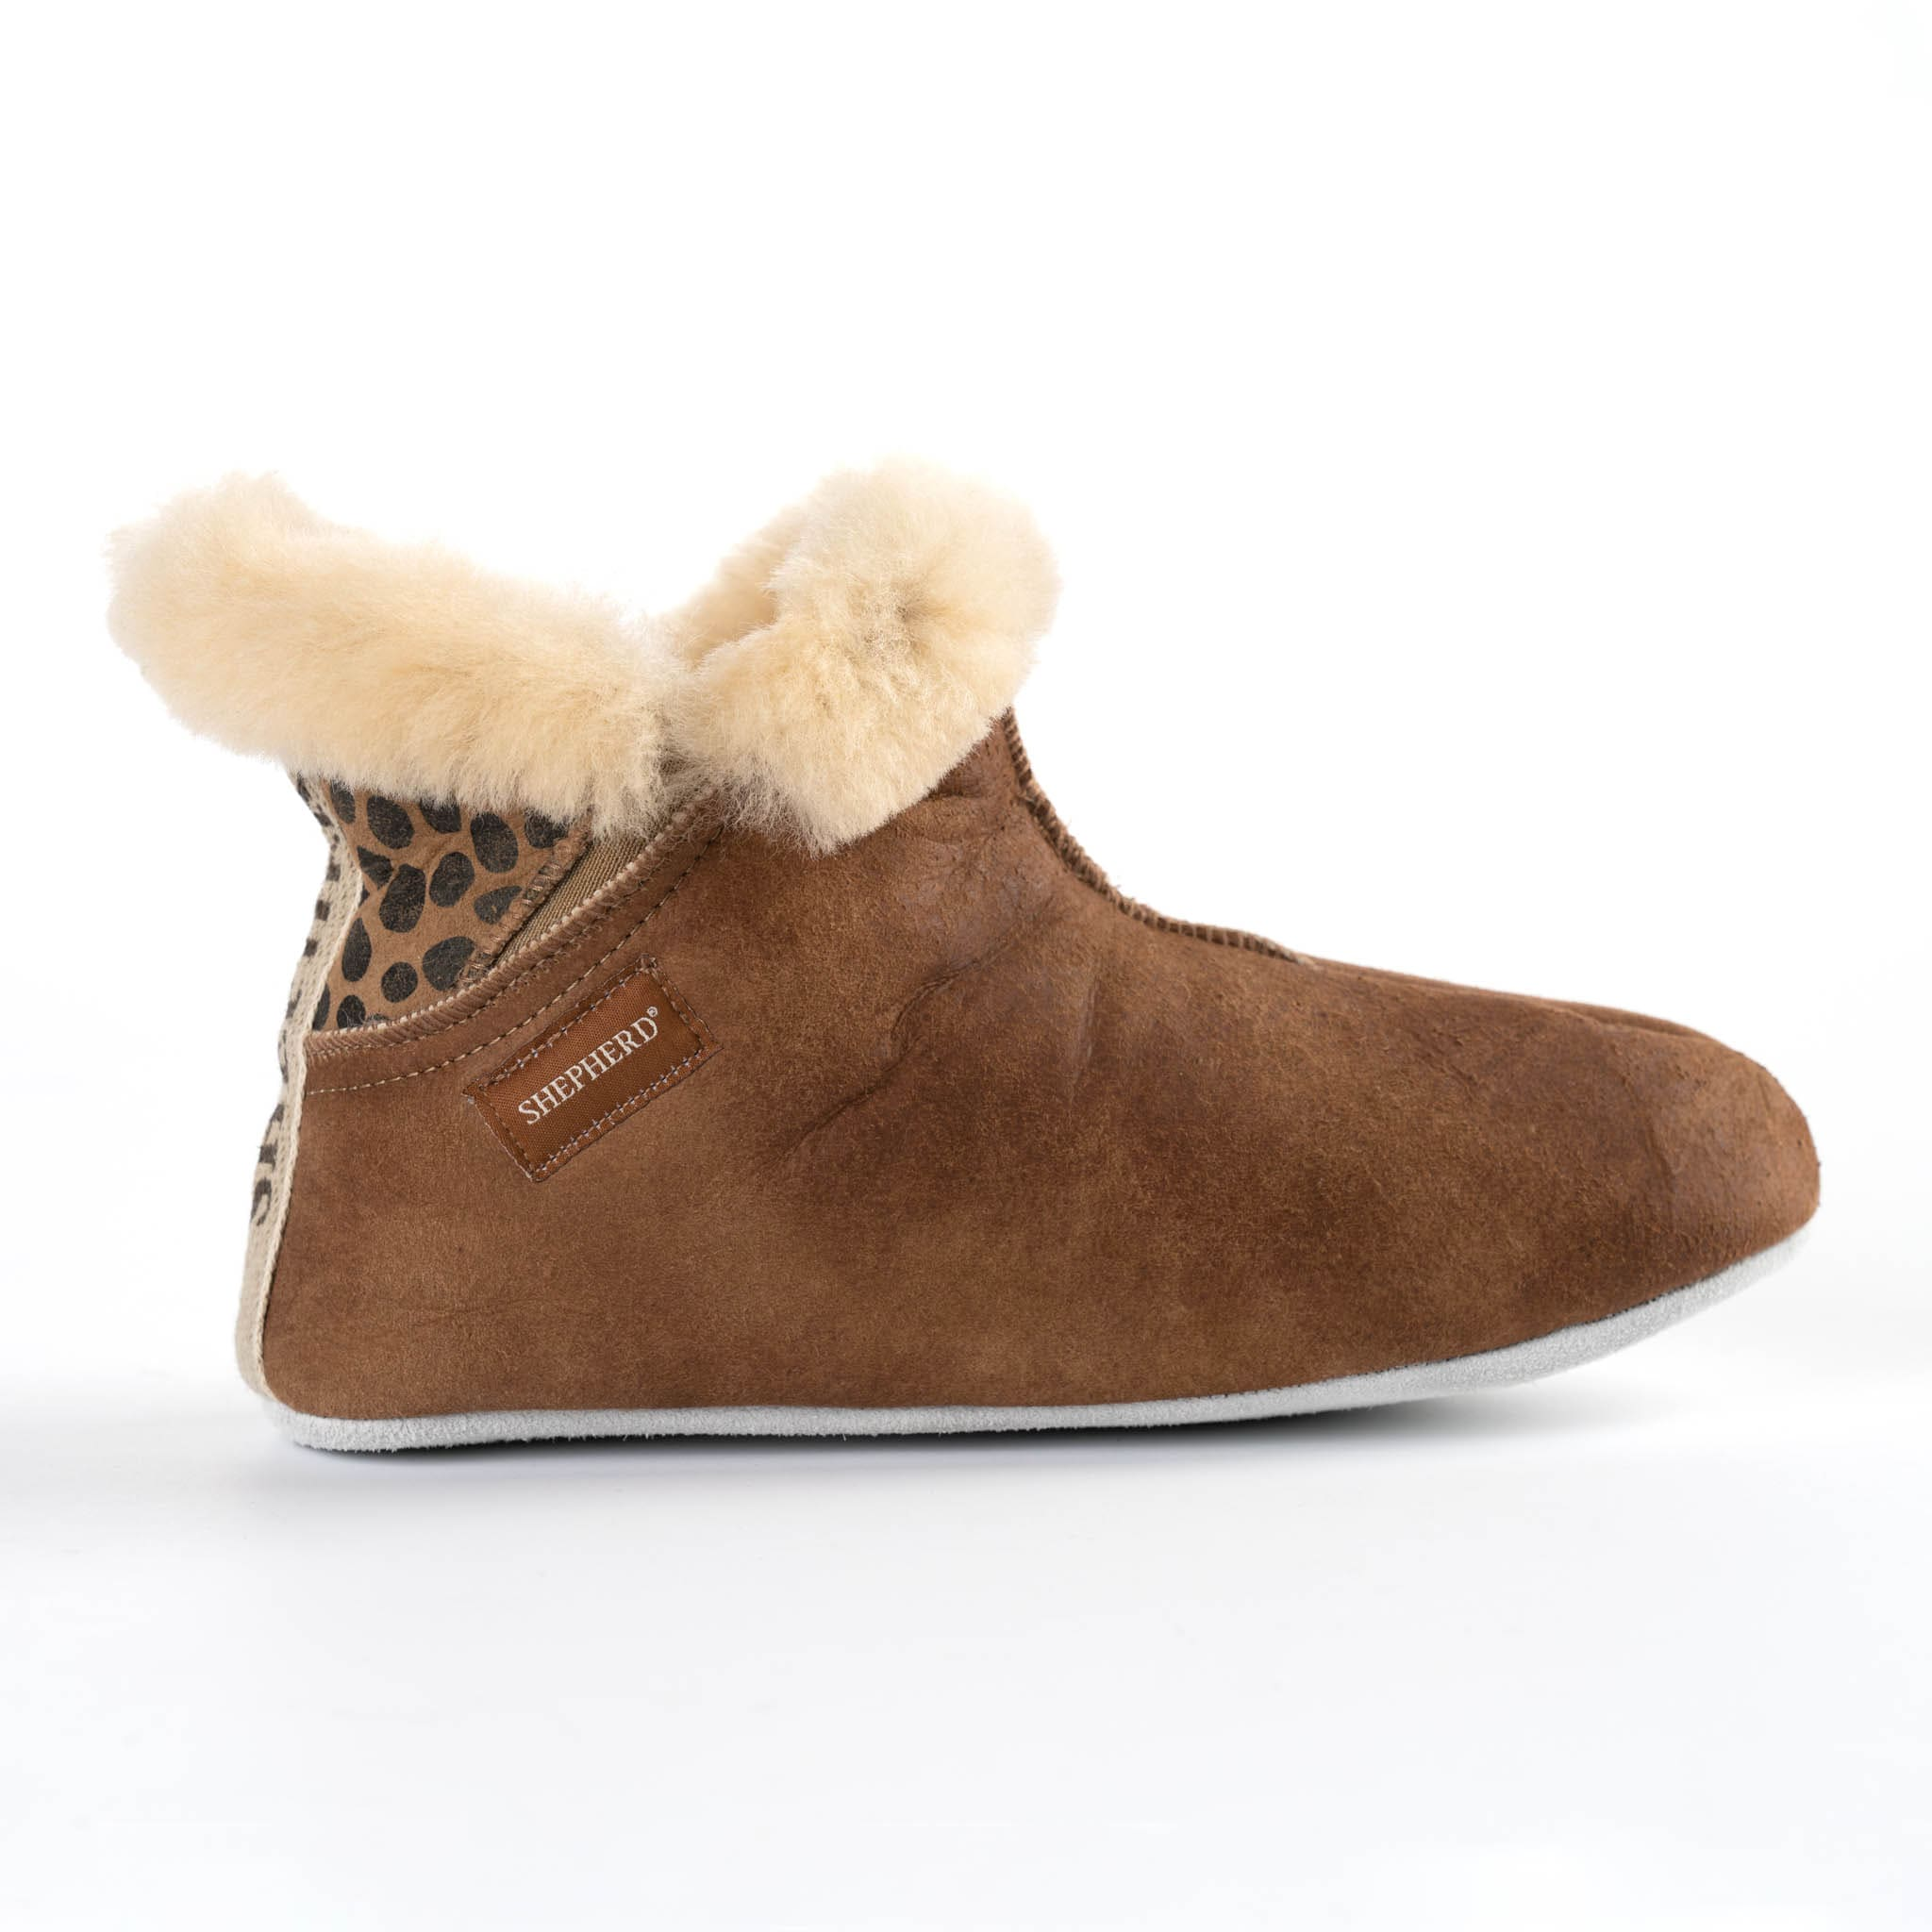 Shepherd Mariette slippers